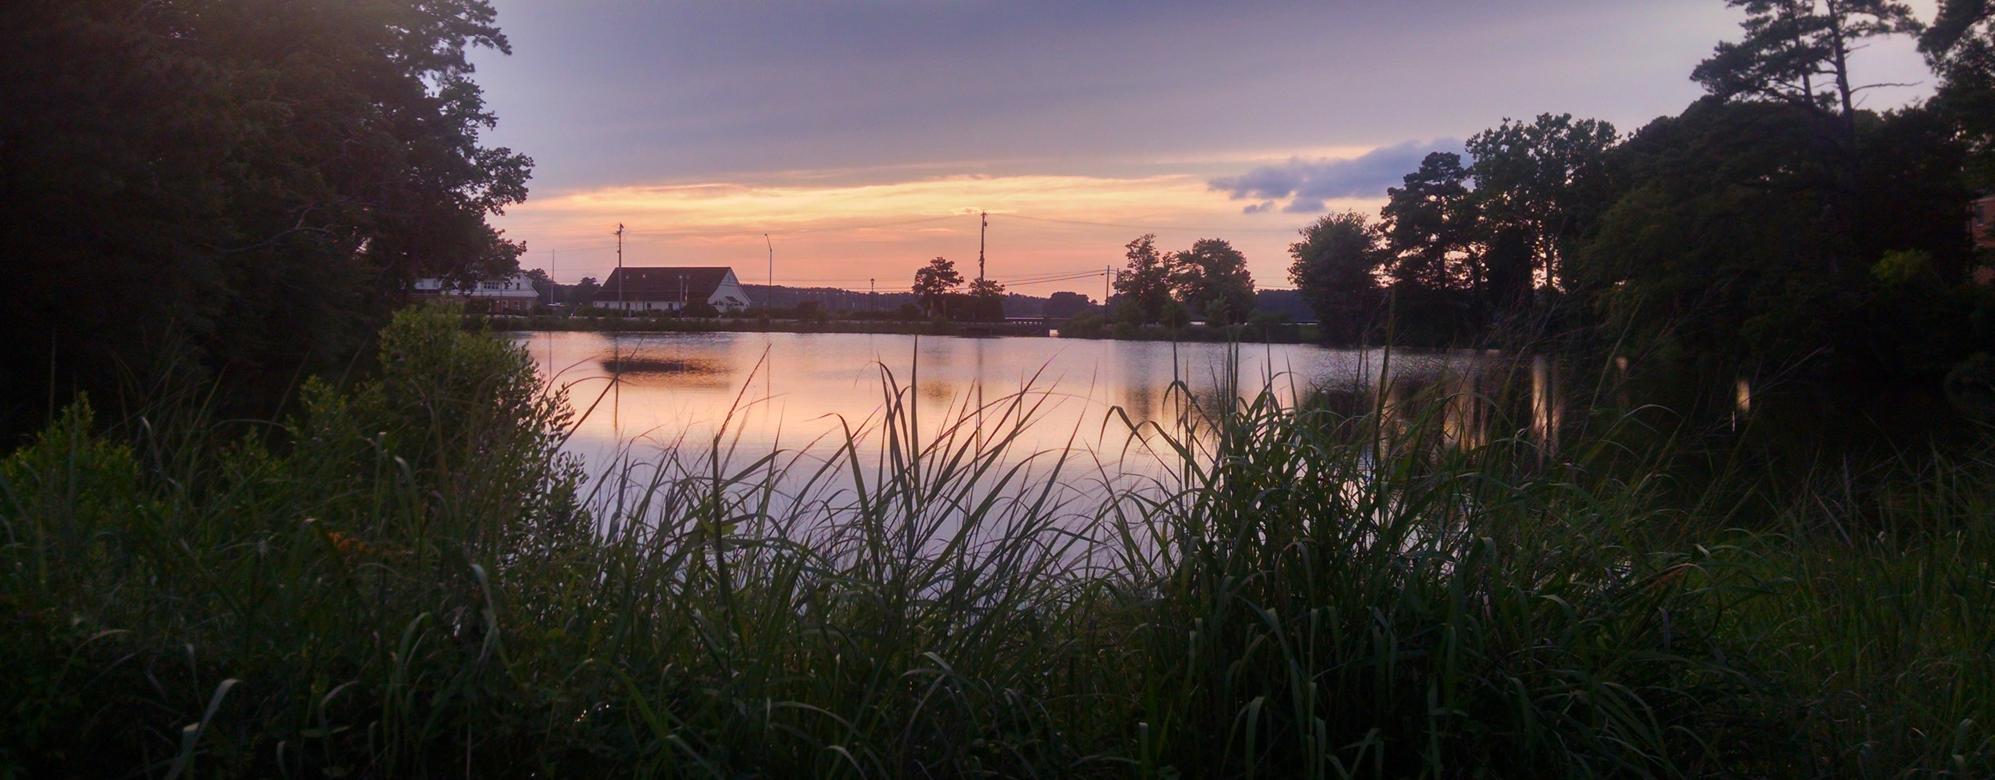 St. John's Pond at sunset, July 2017